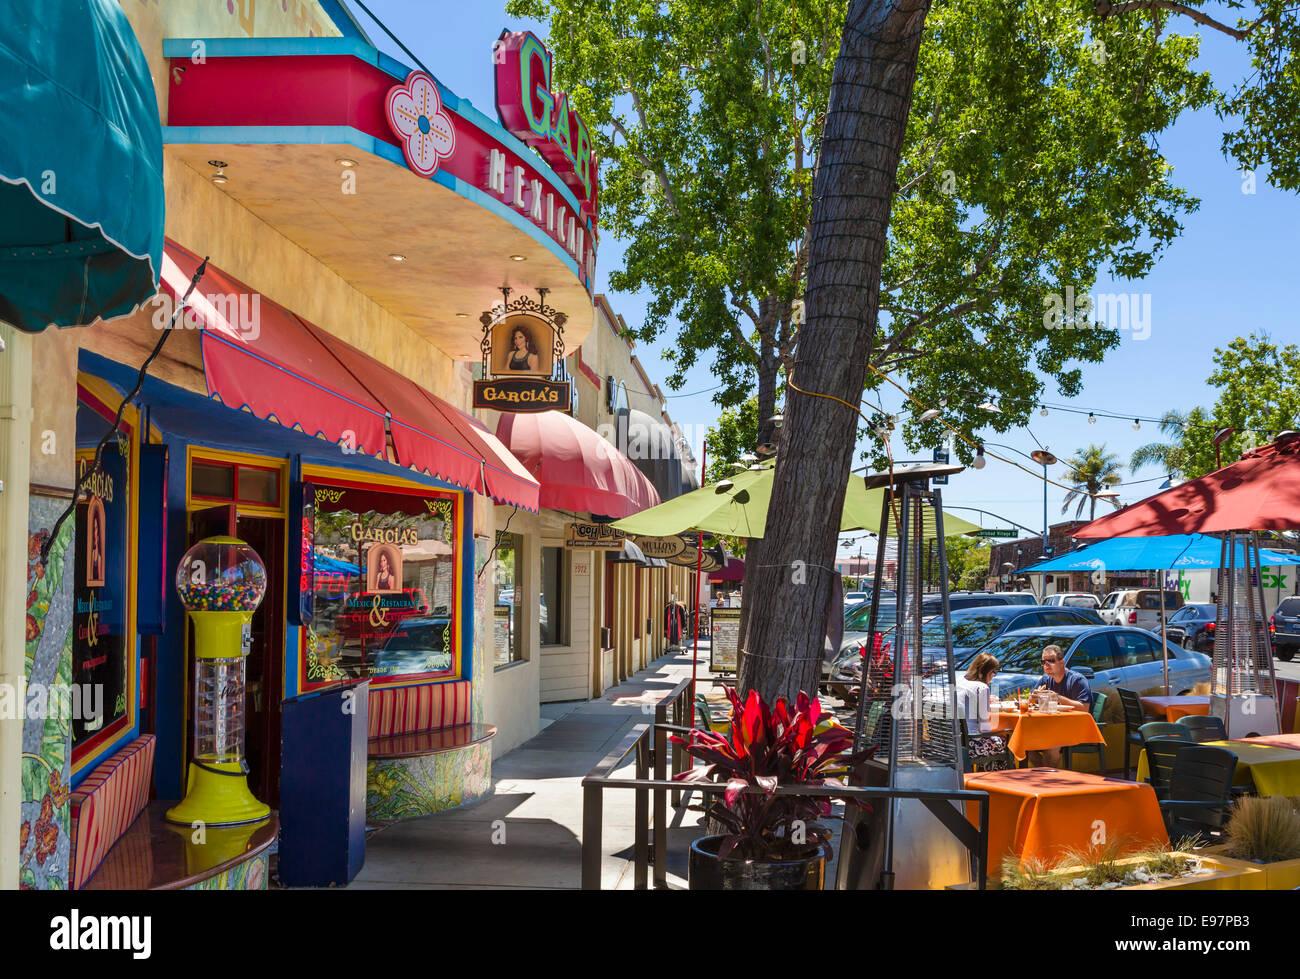 photoshop 1 - San Diego, Orange County Photographer